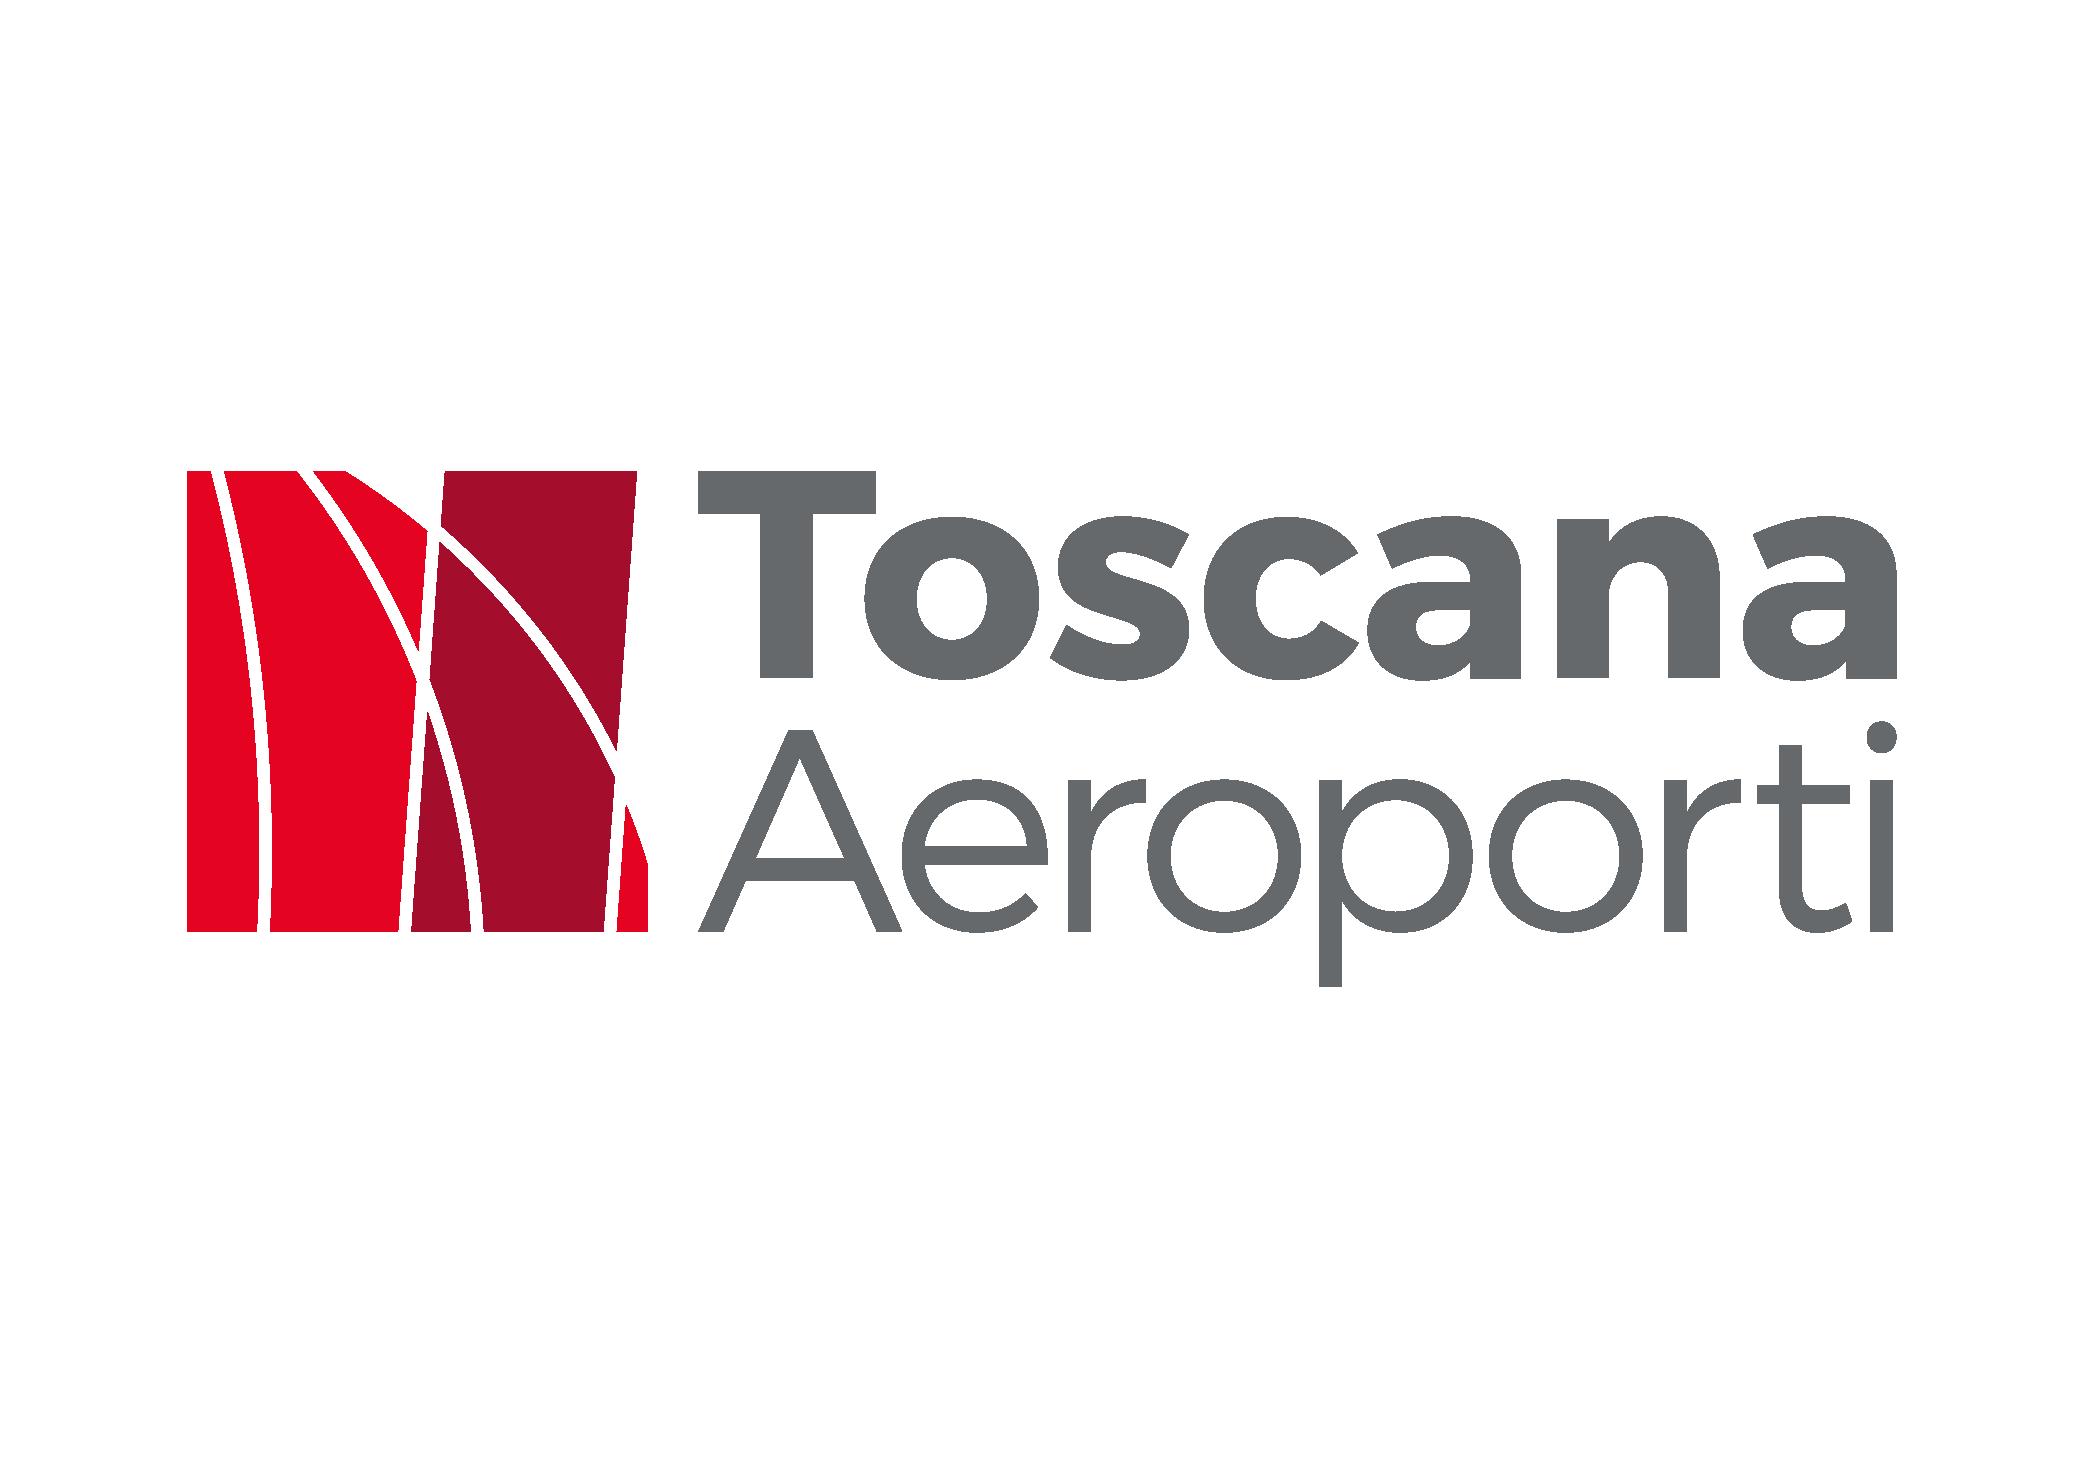 Toscana aeroporti -Talento all Opera